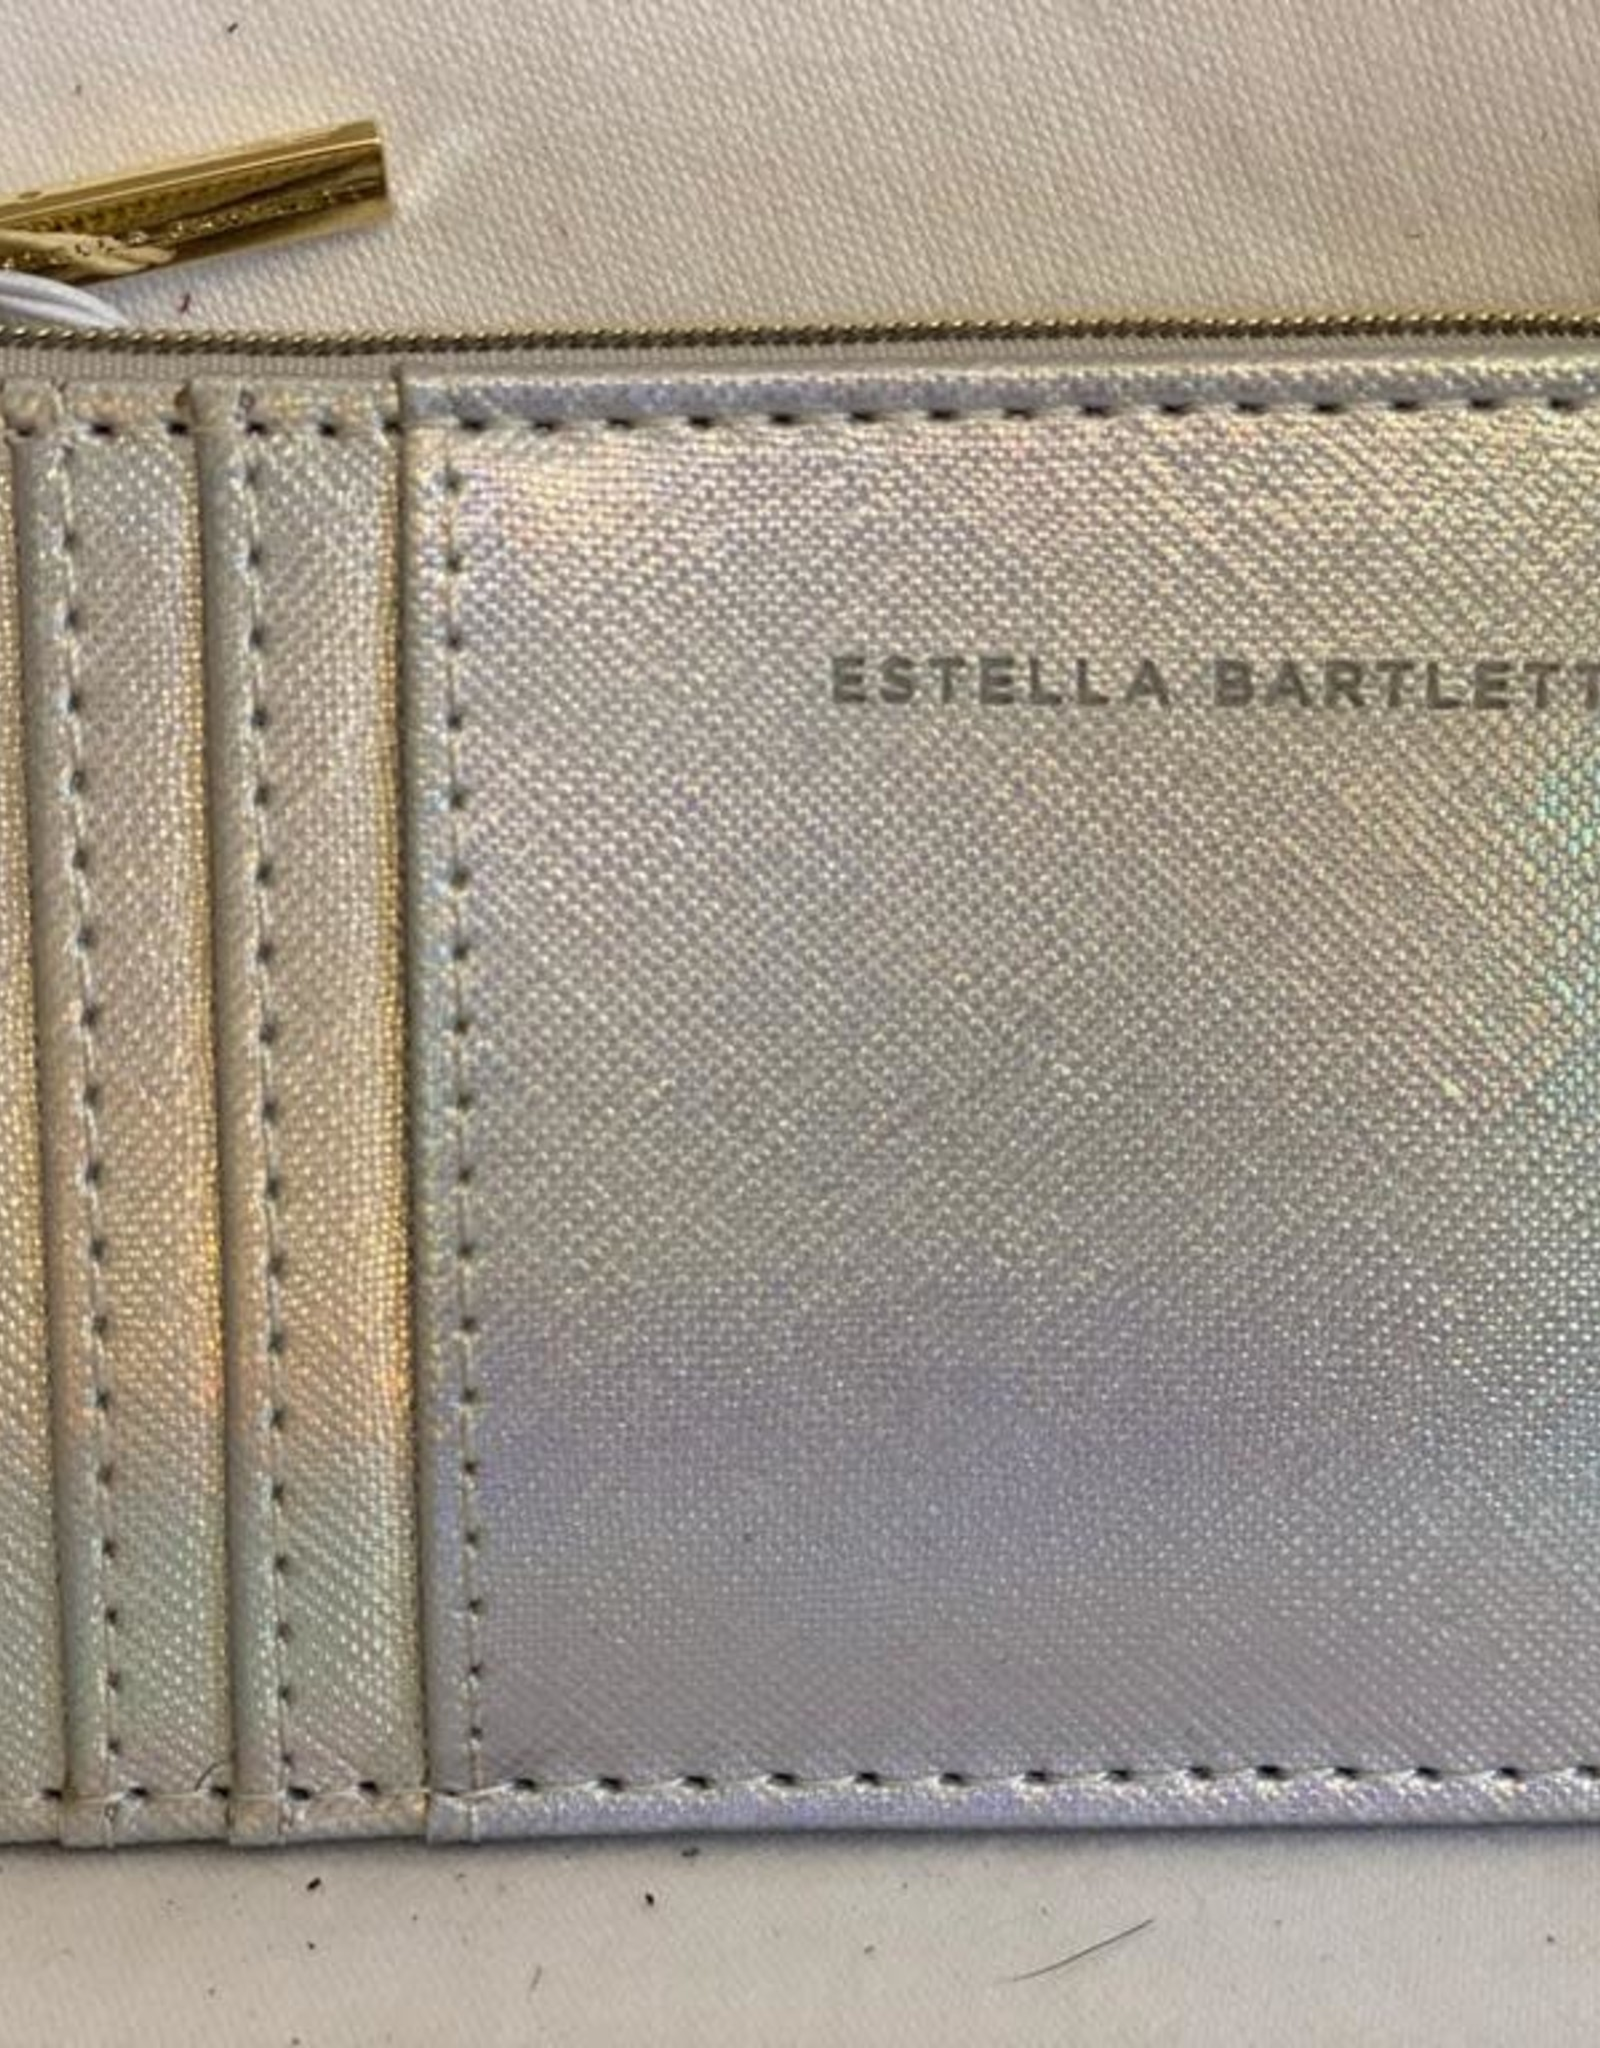 ESTELLA BARTLETT CARD PURSE  BY ESTELLA BARTLETT